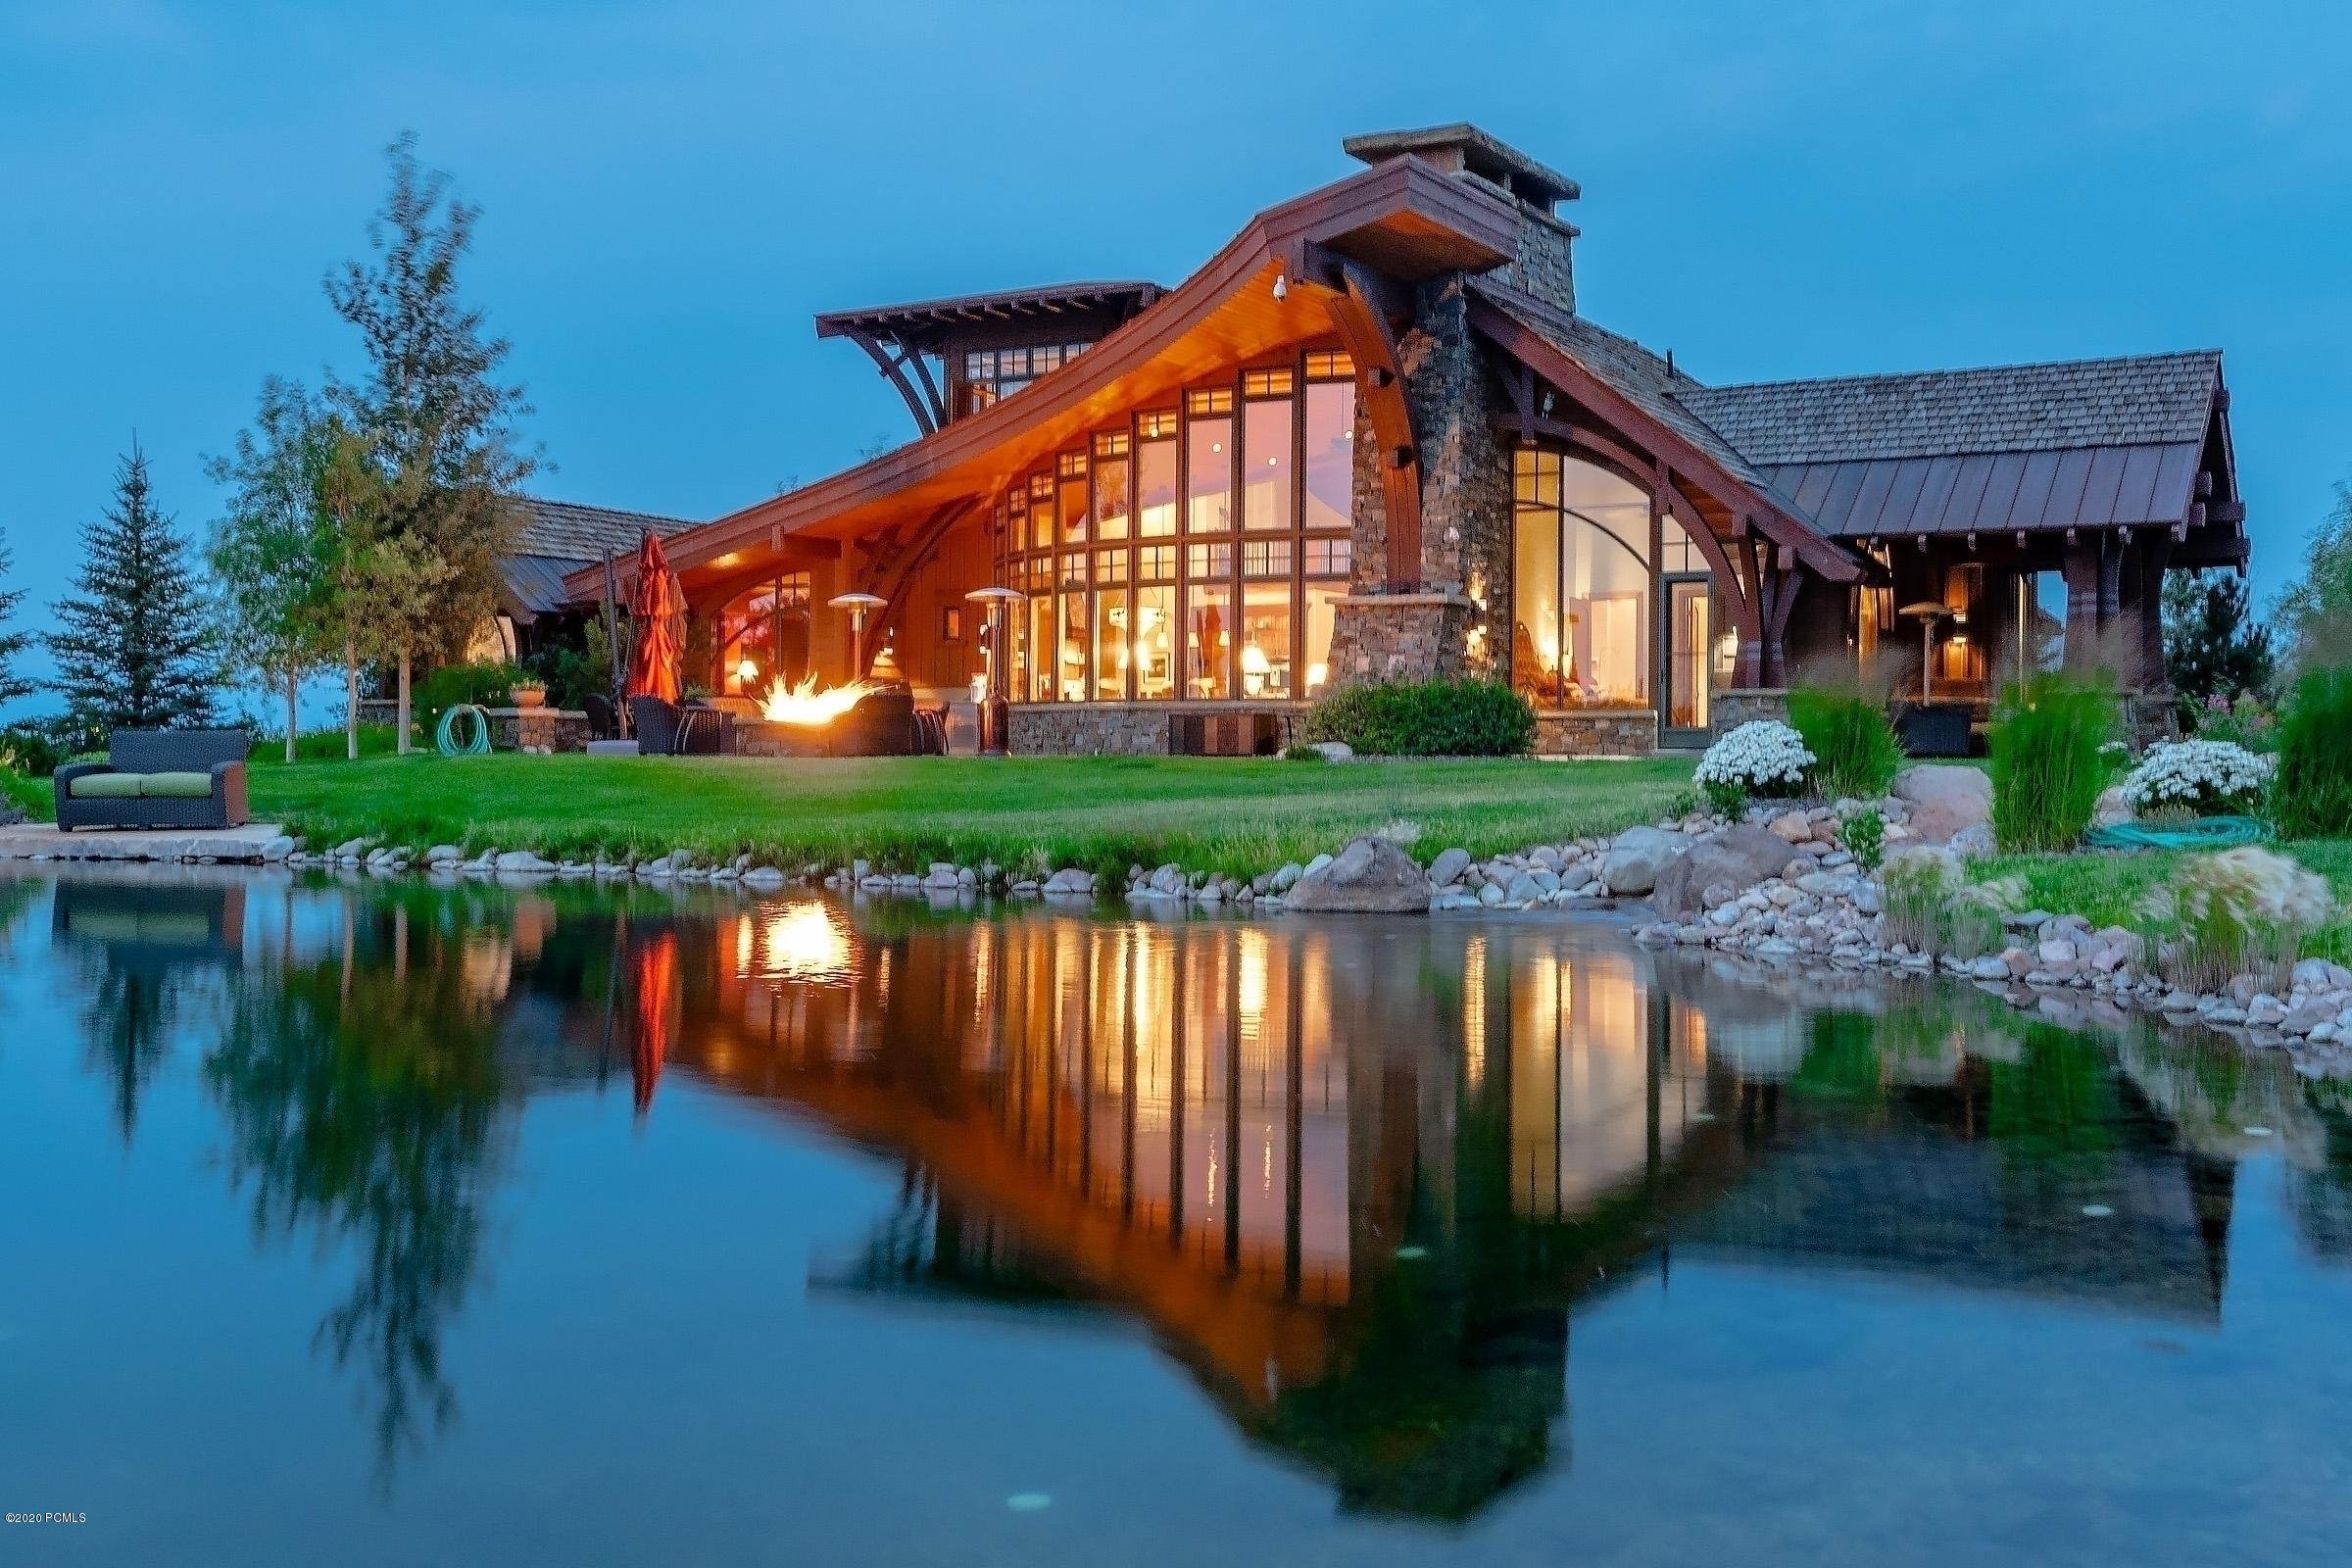 8376 Aspen Ridge Road, Woodland, Utah 84036, 3 Bedrooms Bedrooms, ,4 BathroomsBathrooms,Single Family,For Sale,Aspen Ridge,20190109112430415765000000